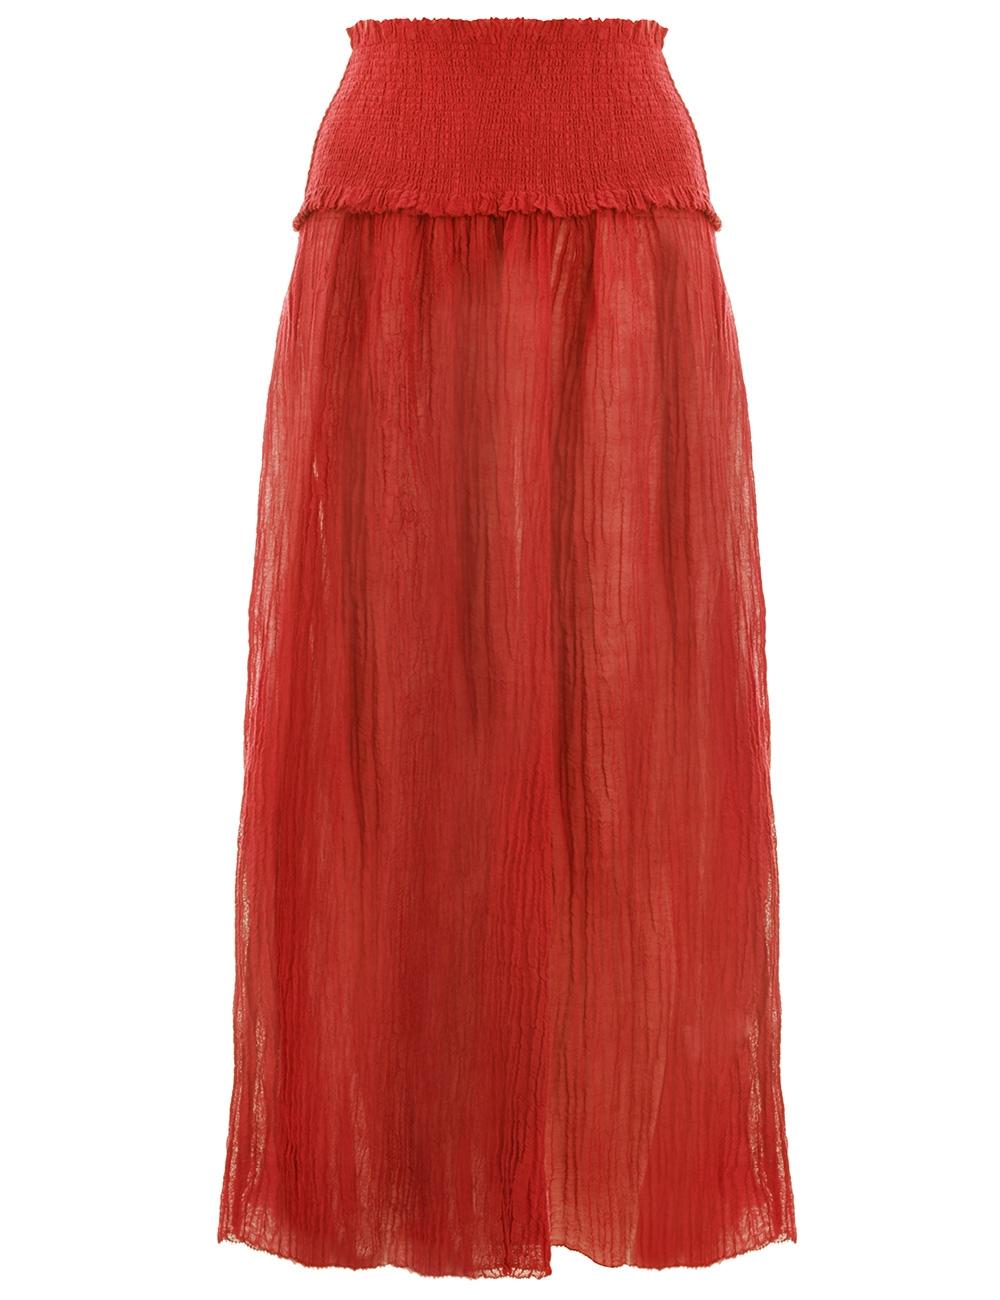 Veneto Shirred Waist Skirt